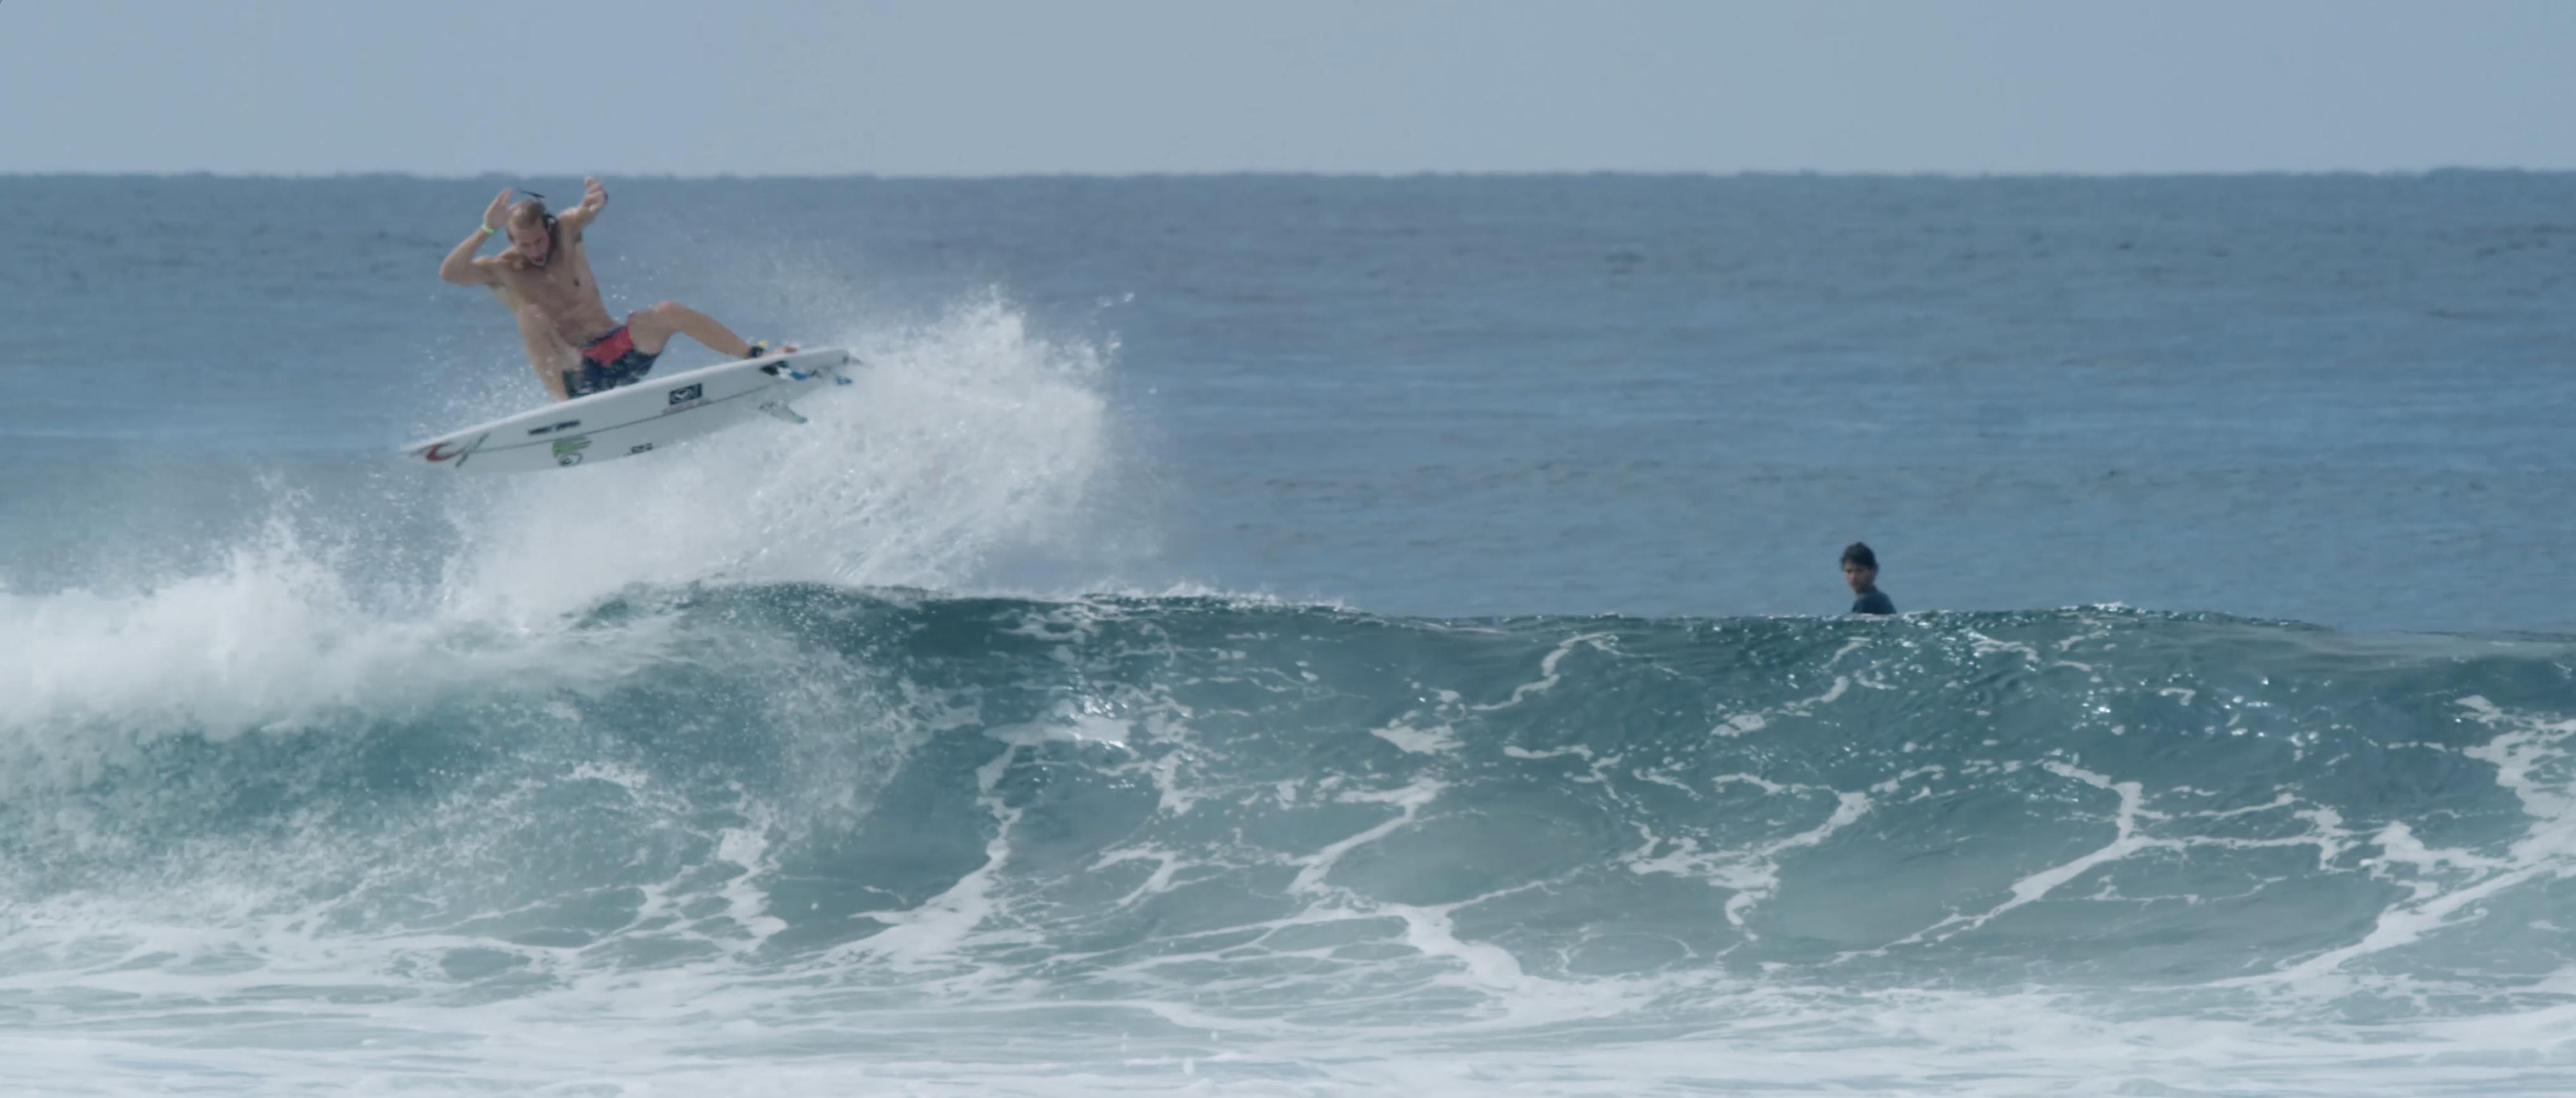 Roderik Surfer